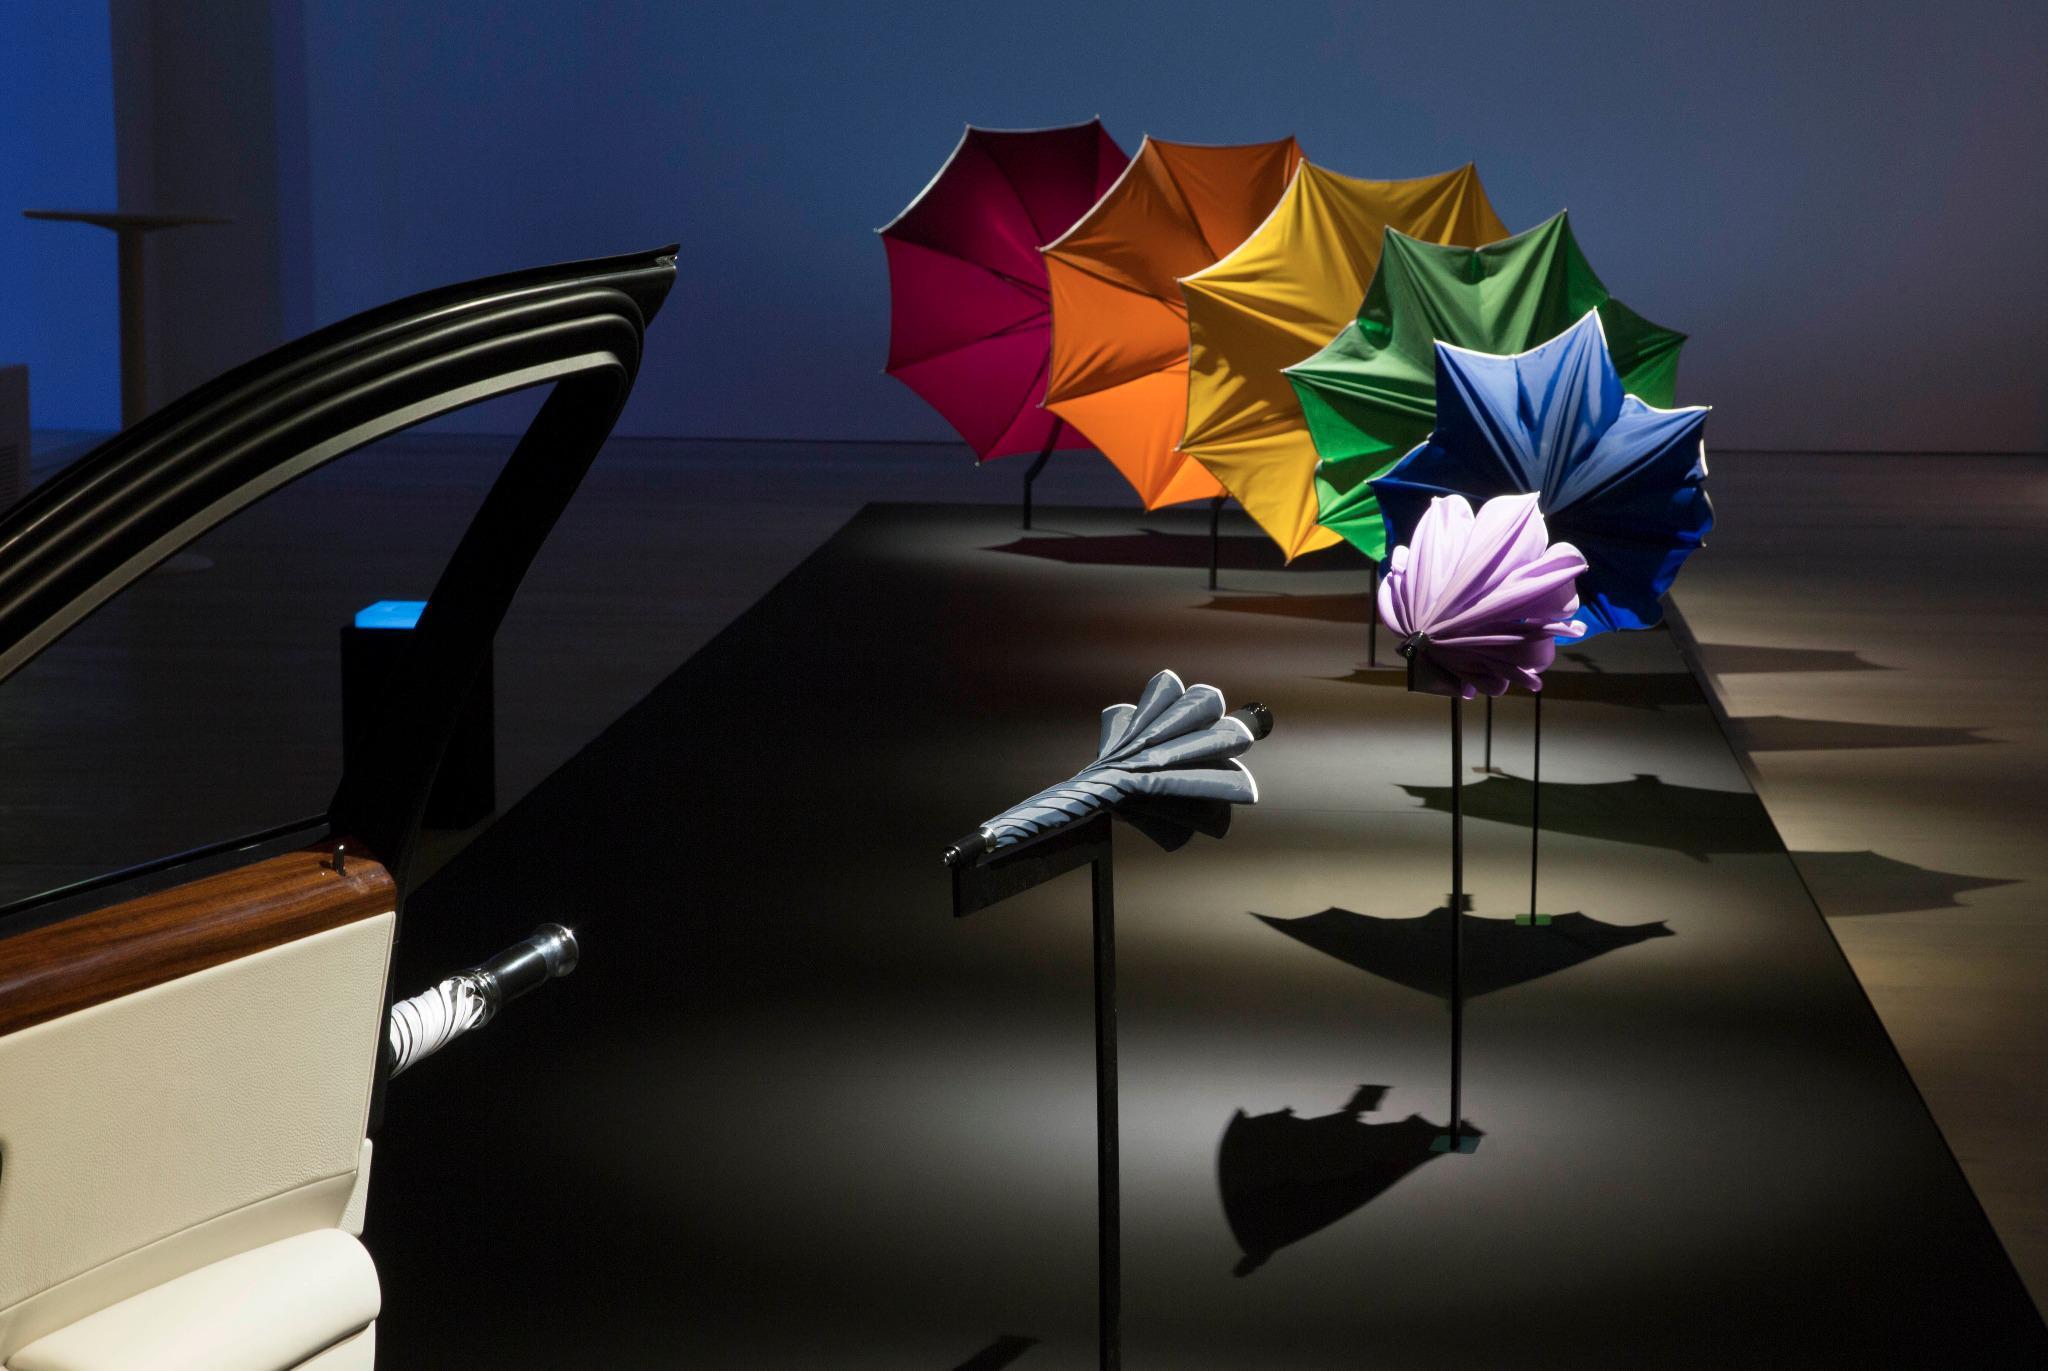 .@SteveLidbury demonstrates Rolls Royces' hidden umbrellas. In spectacular fashion. #IWIDT http://t.co/XHEVdLFSQx